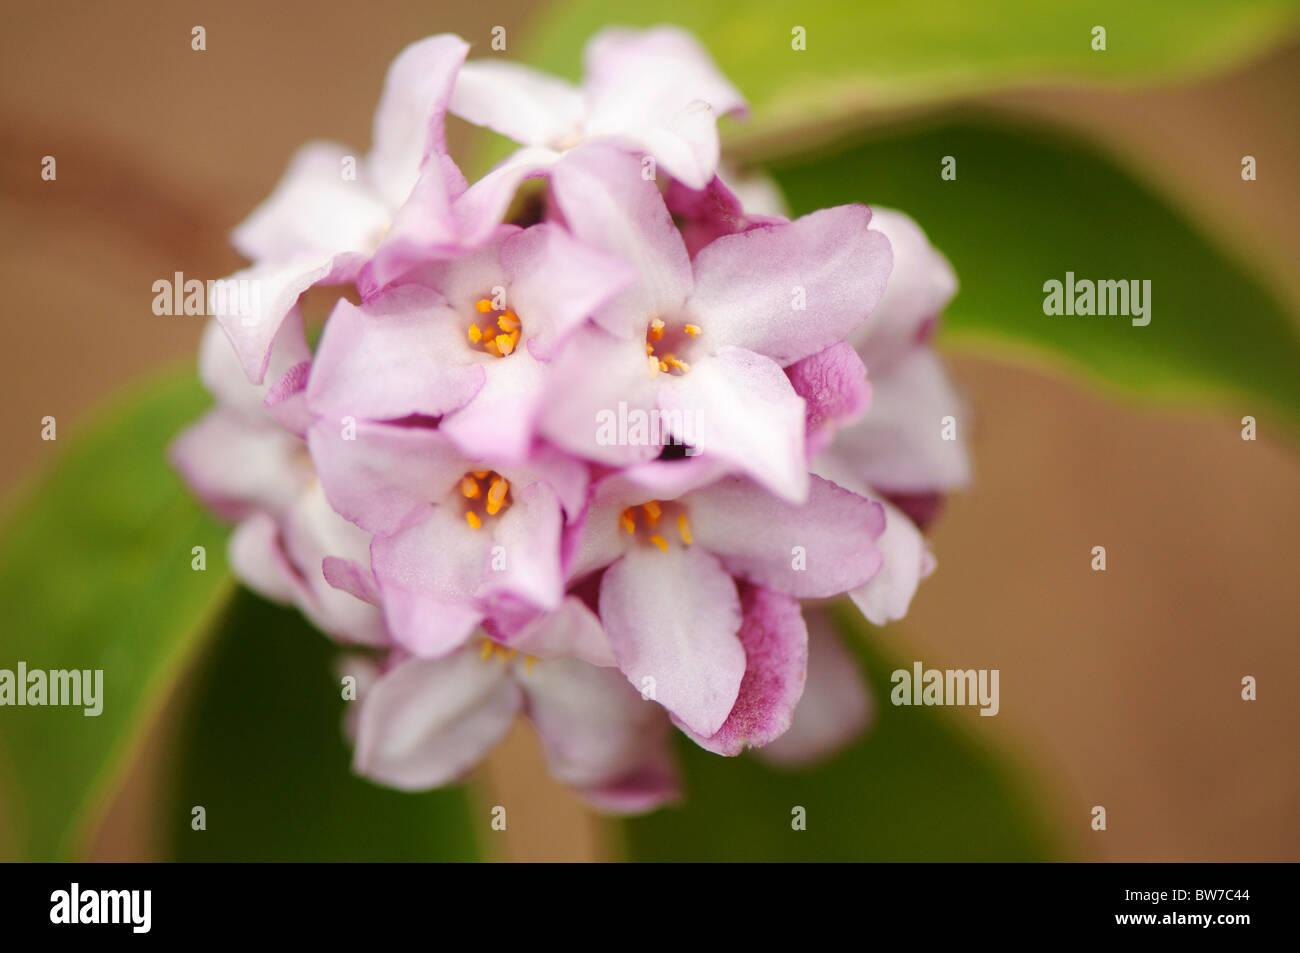 A single round flowerhead of Daphne bholua 'Limpsfield' - Stock Image